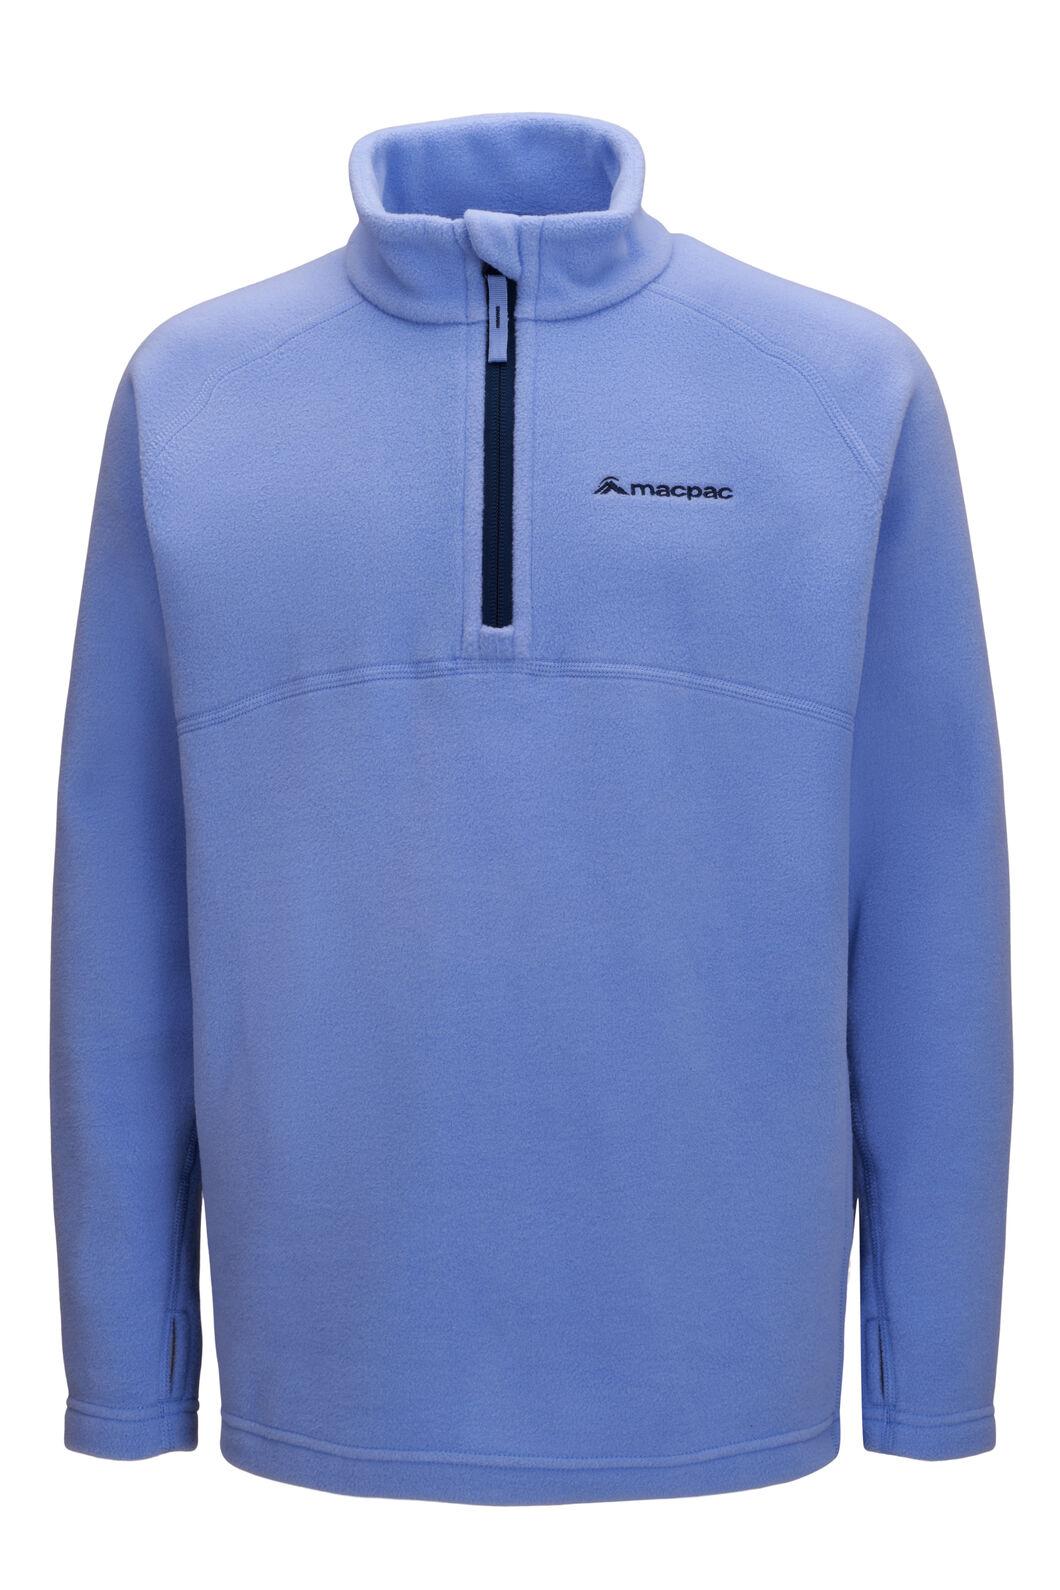 Macpac Kids' Tui Polartec® Fleece Pullover, Cornflower, hi-res